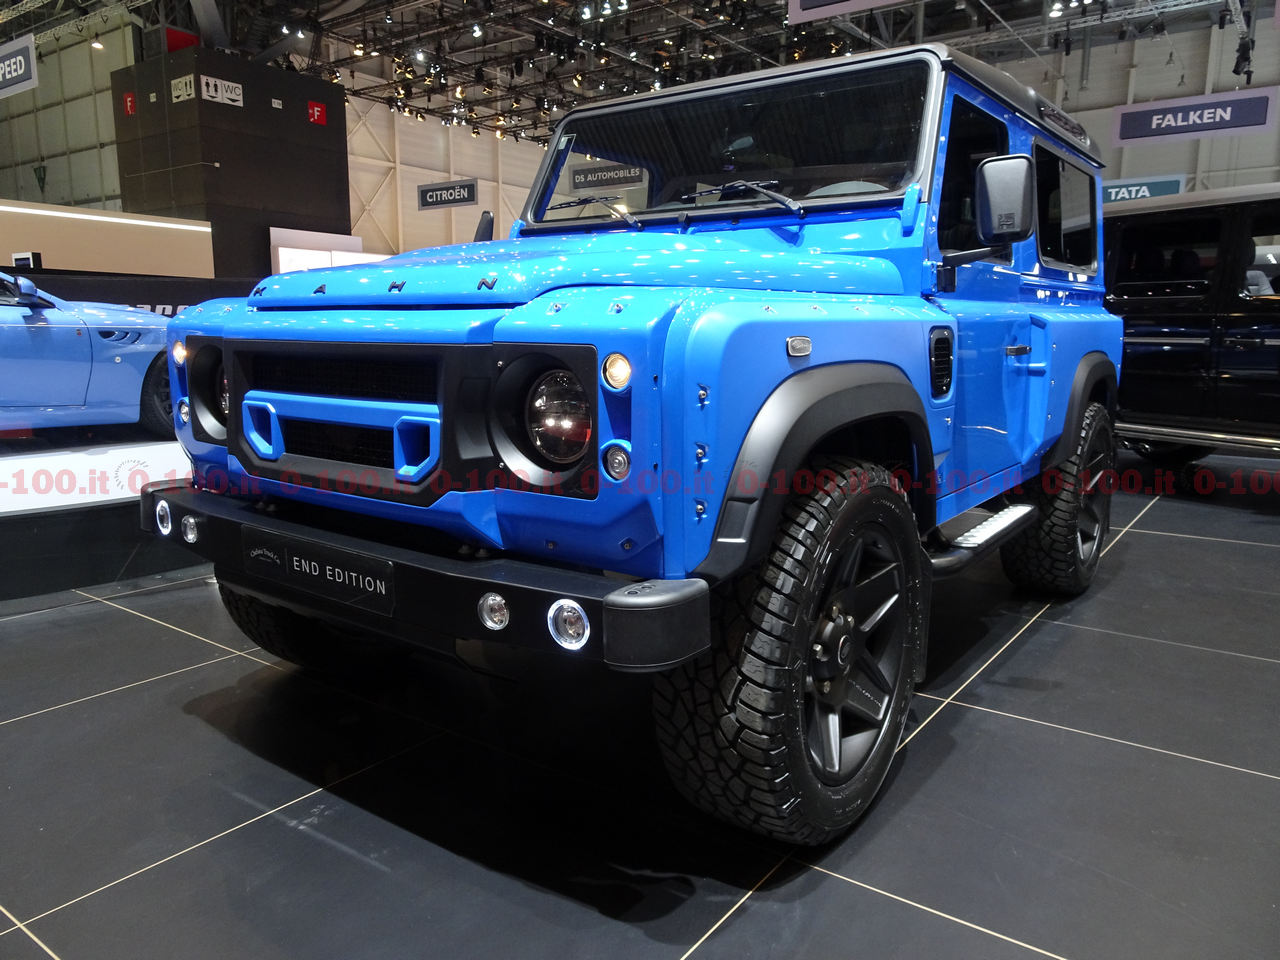 Geneve-ginevra-geneva-2017_tuning-khan-design-chelsea-truck-land-rover-defender_0-100_1